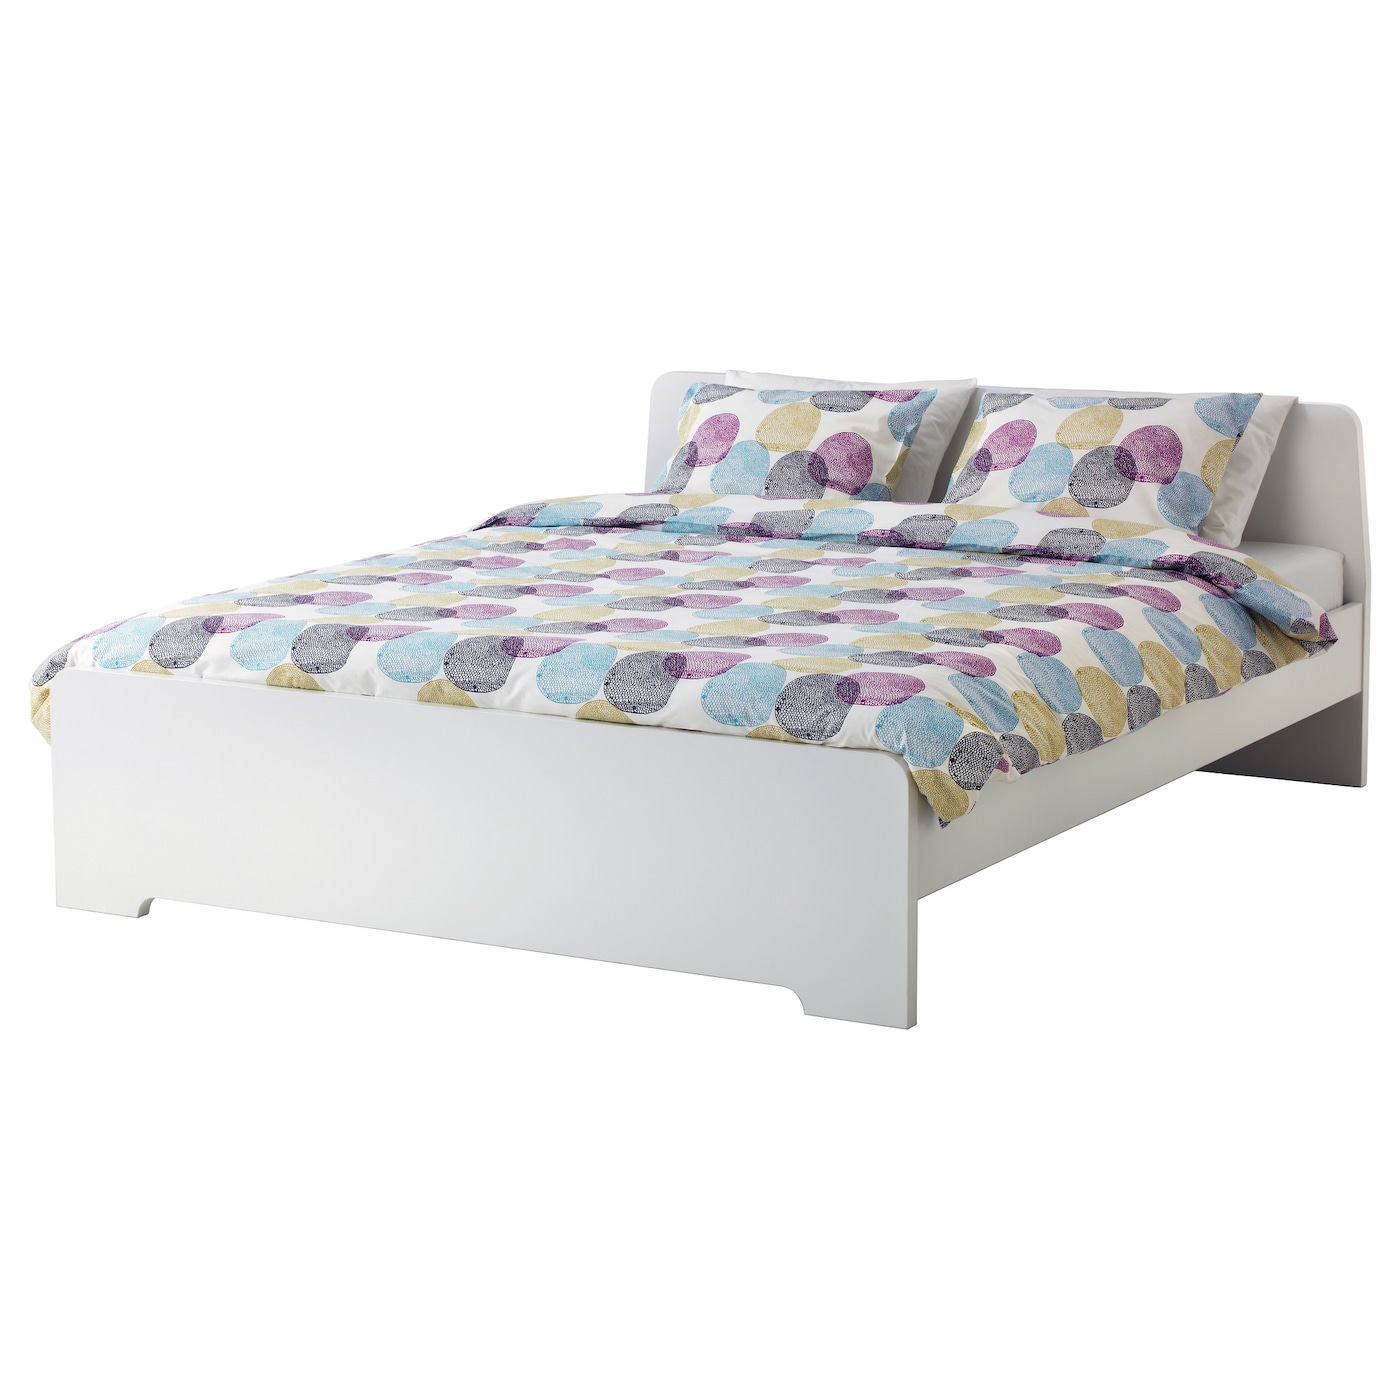 Askvoll cadre de lit blanc 140 x 200 cm ikea for Cadres de lit ikea